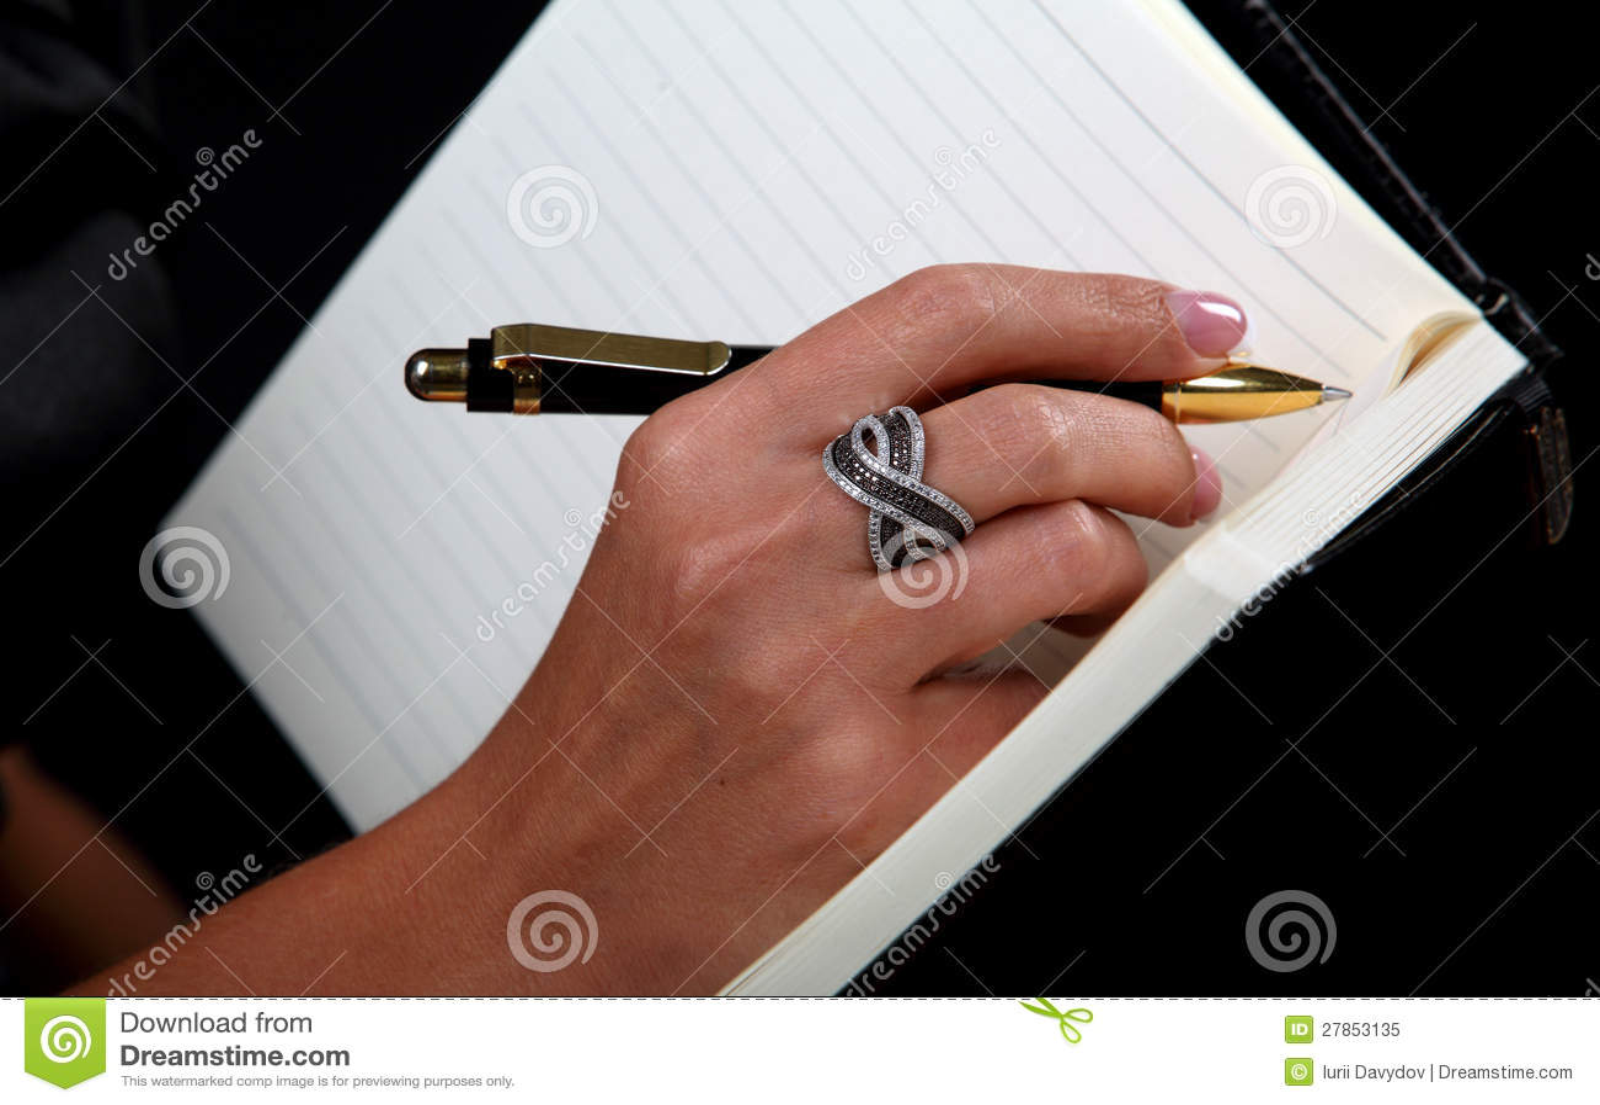 Kobiet `s ręka na notatniku